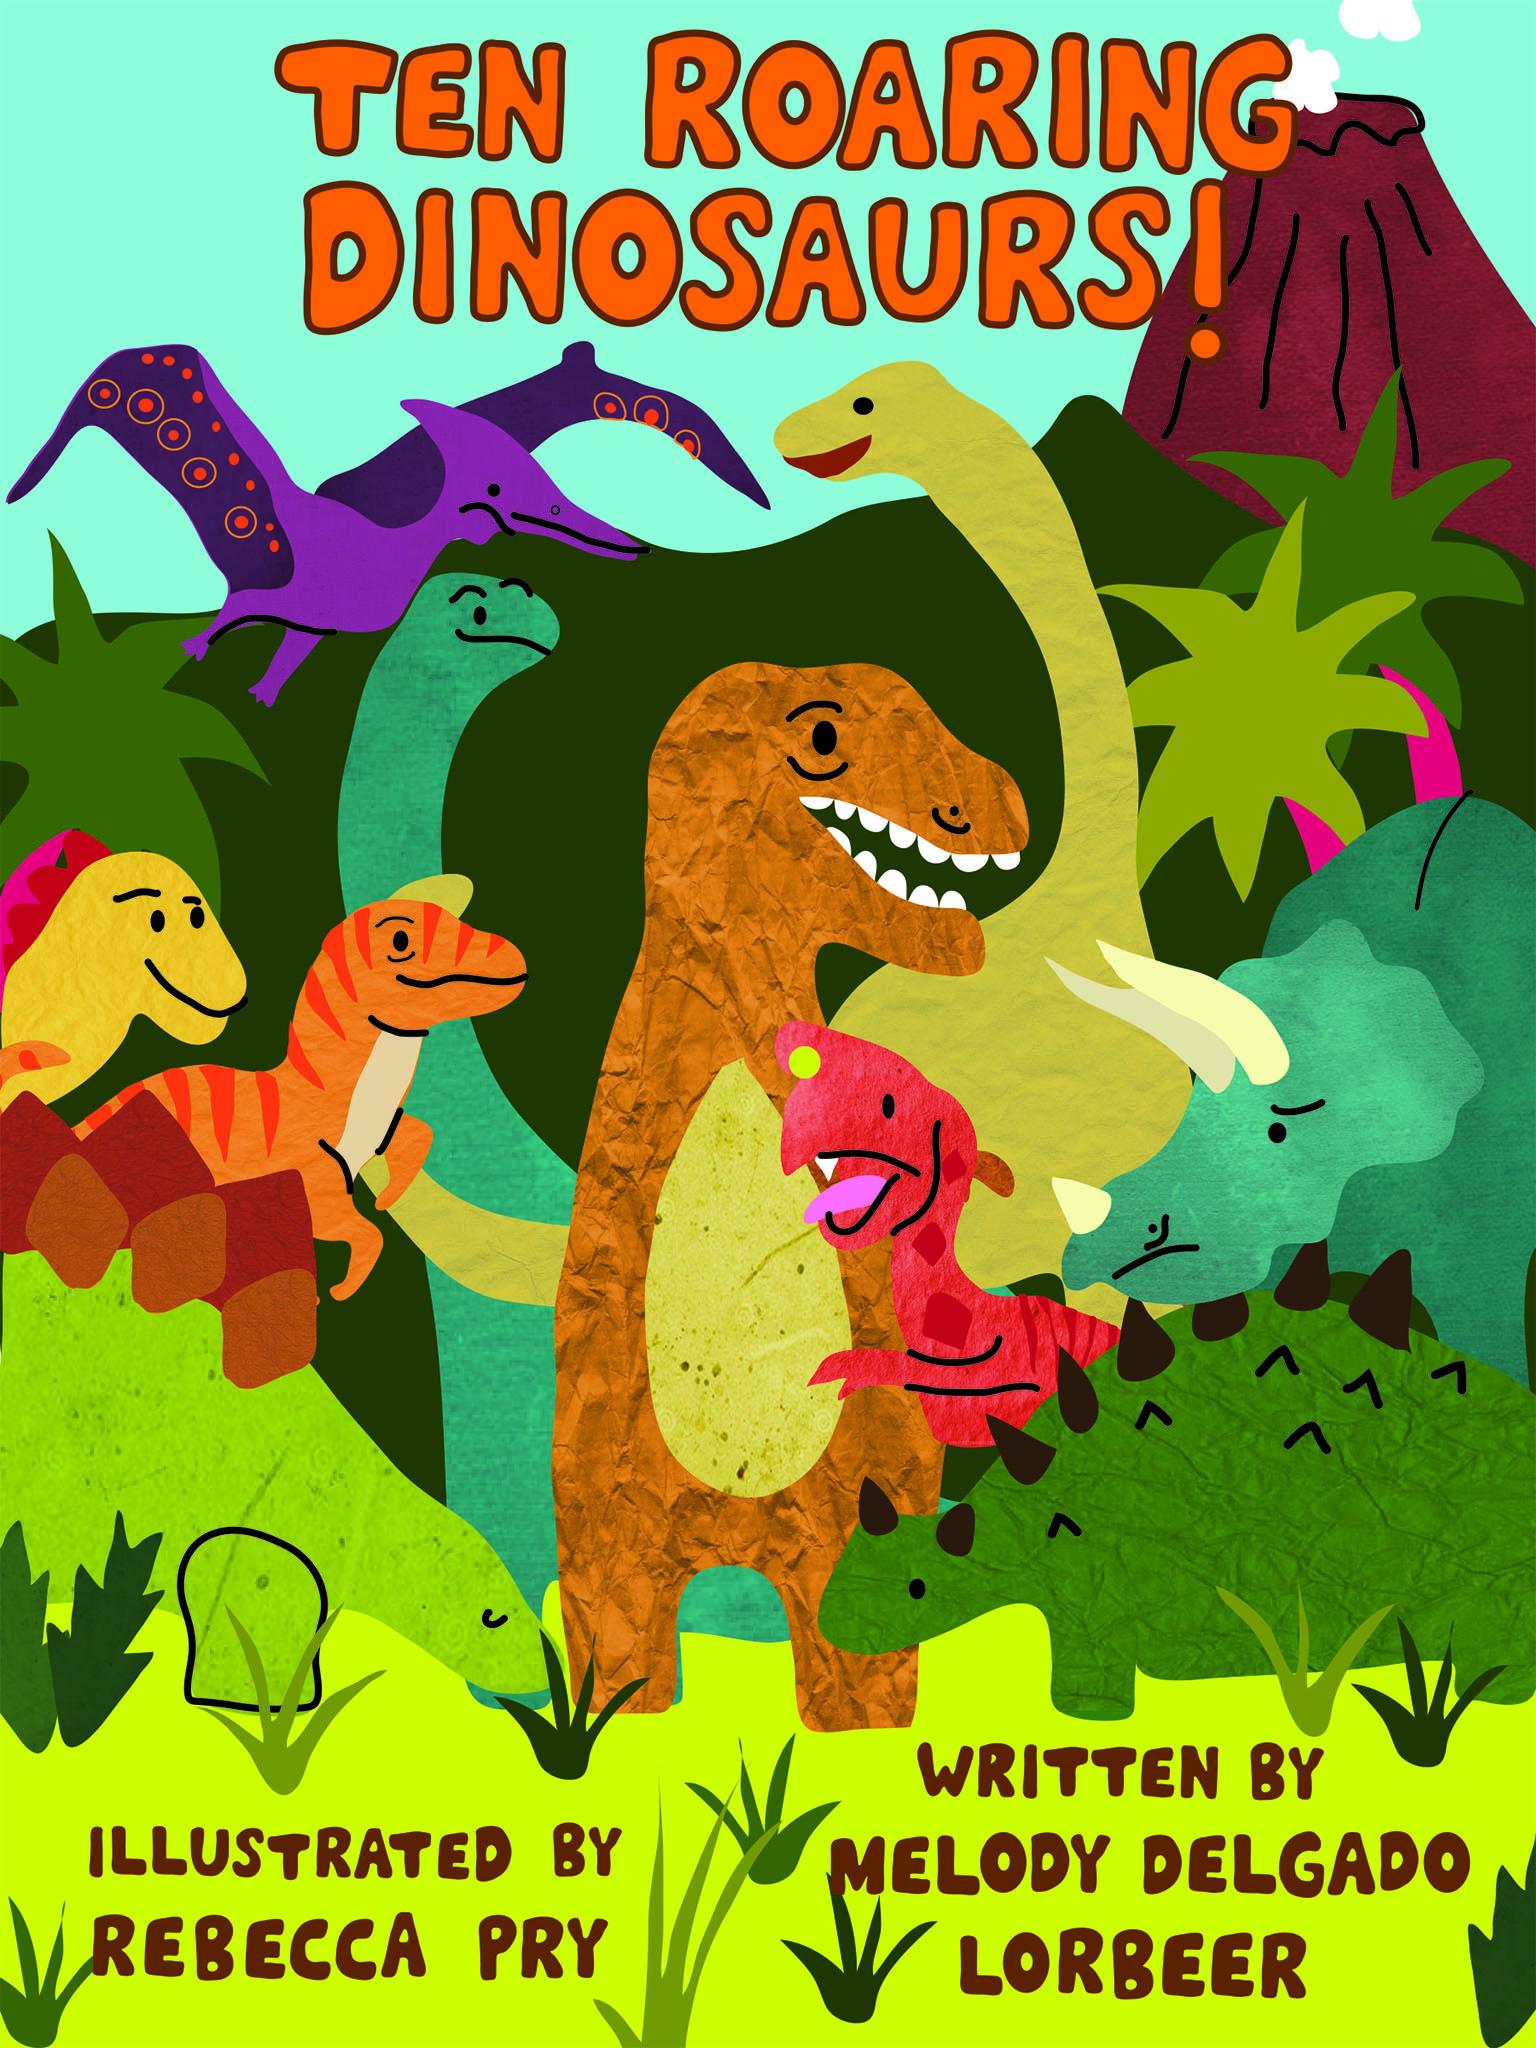 Ten Roaring Dinosaurs